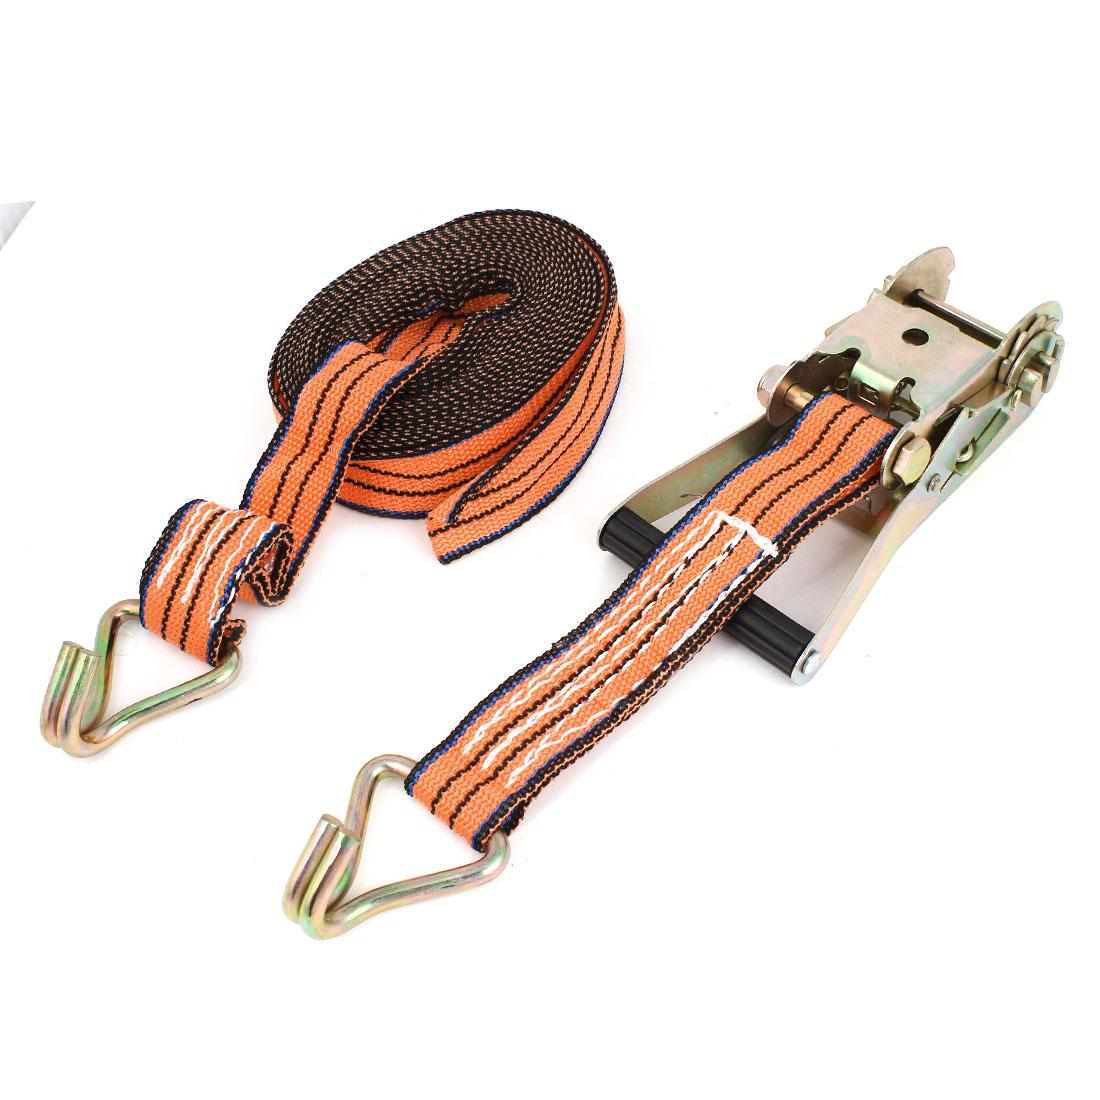 Ratchet Ratcheting Tie Down Strap Cargo Tow Rope Orange Black 8mx40mm